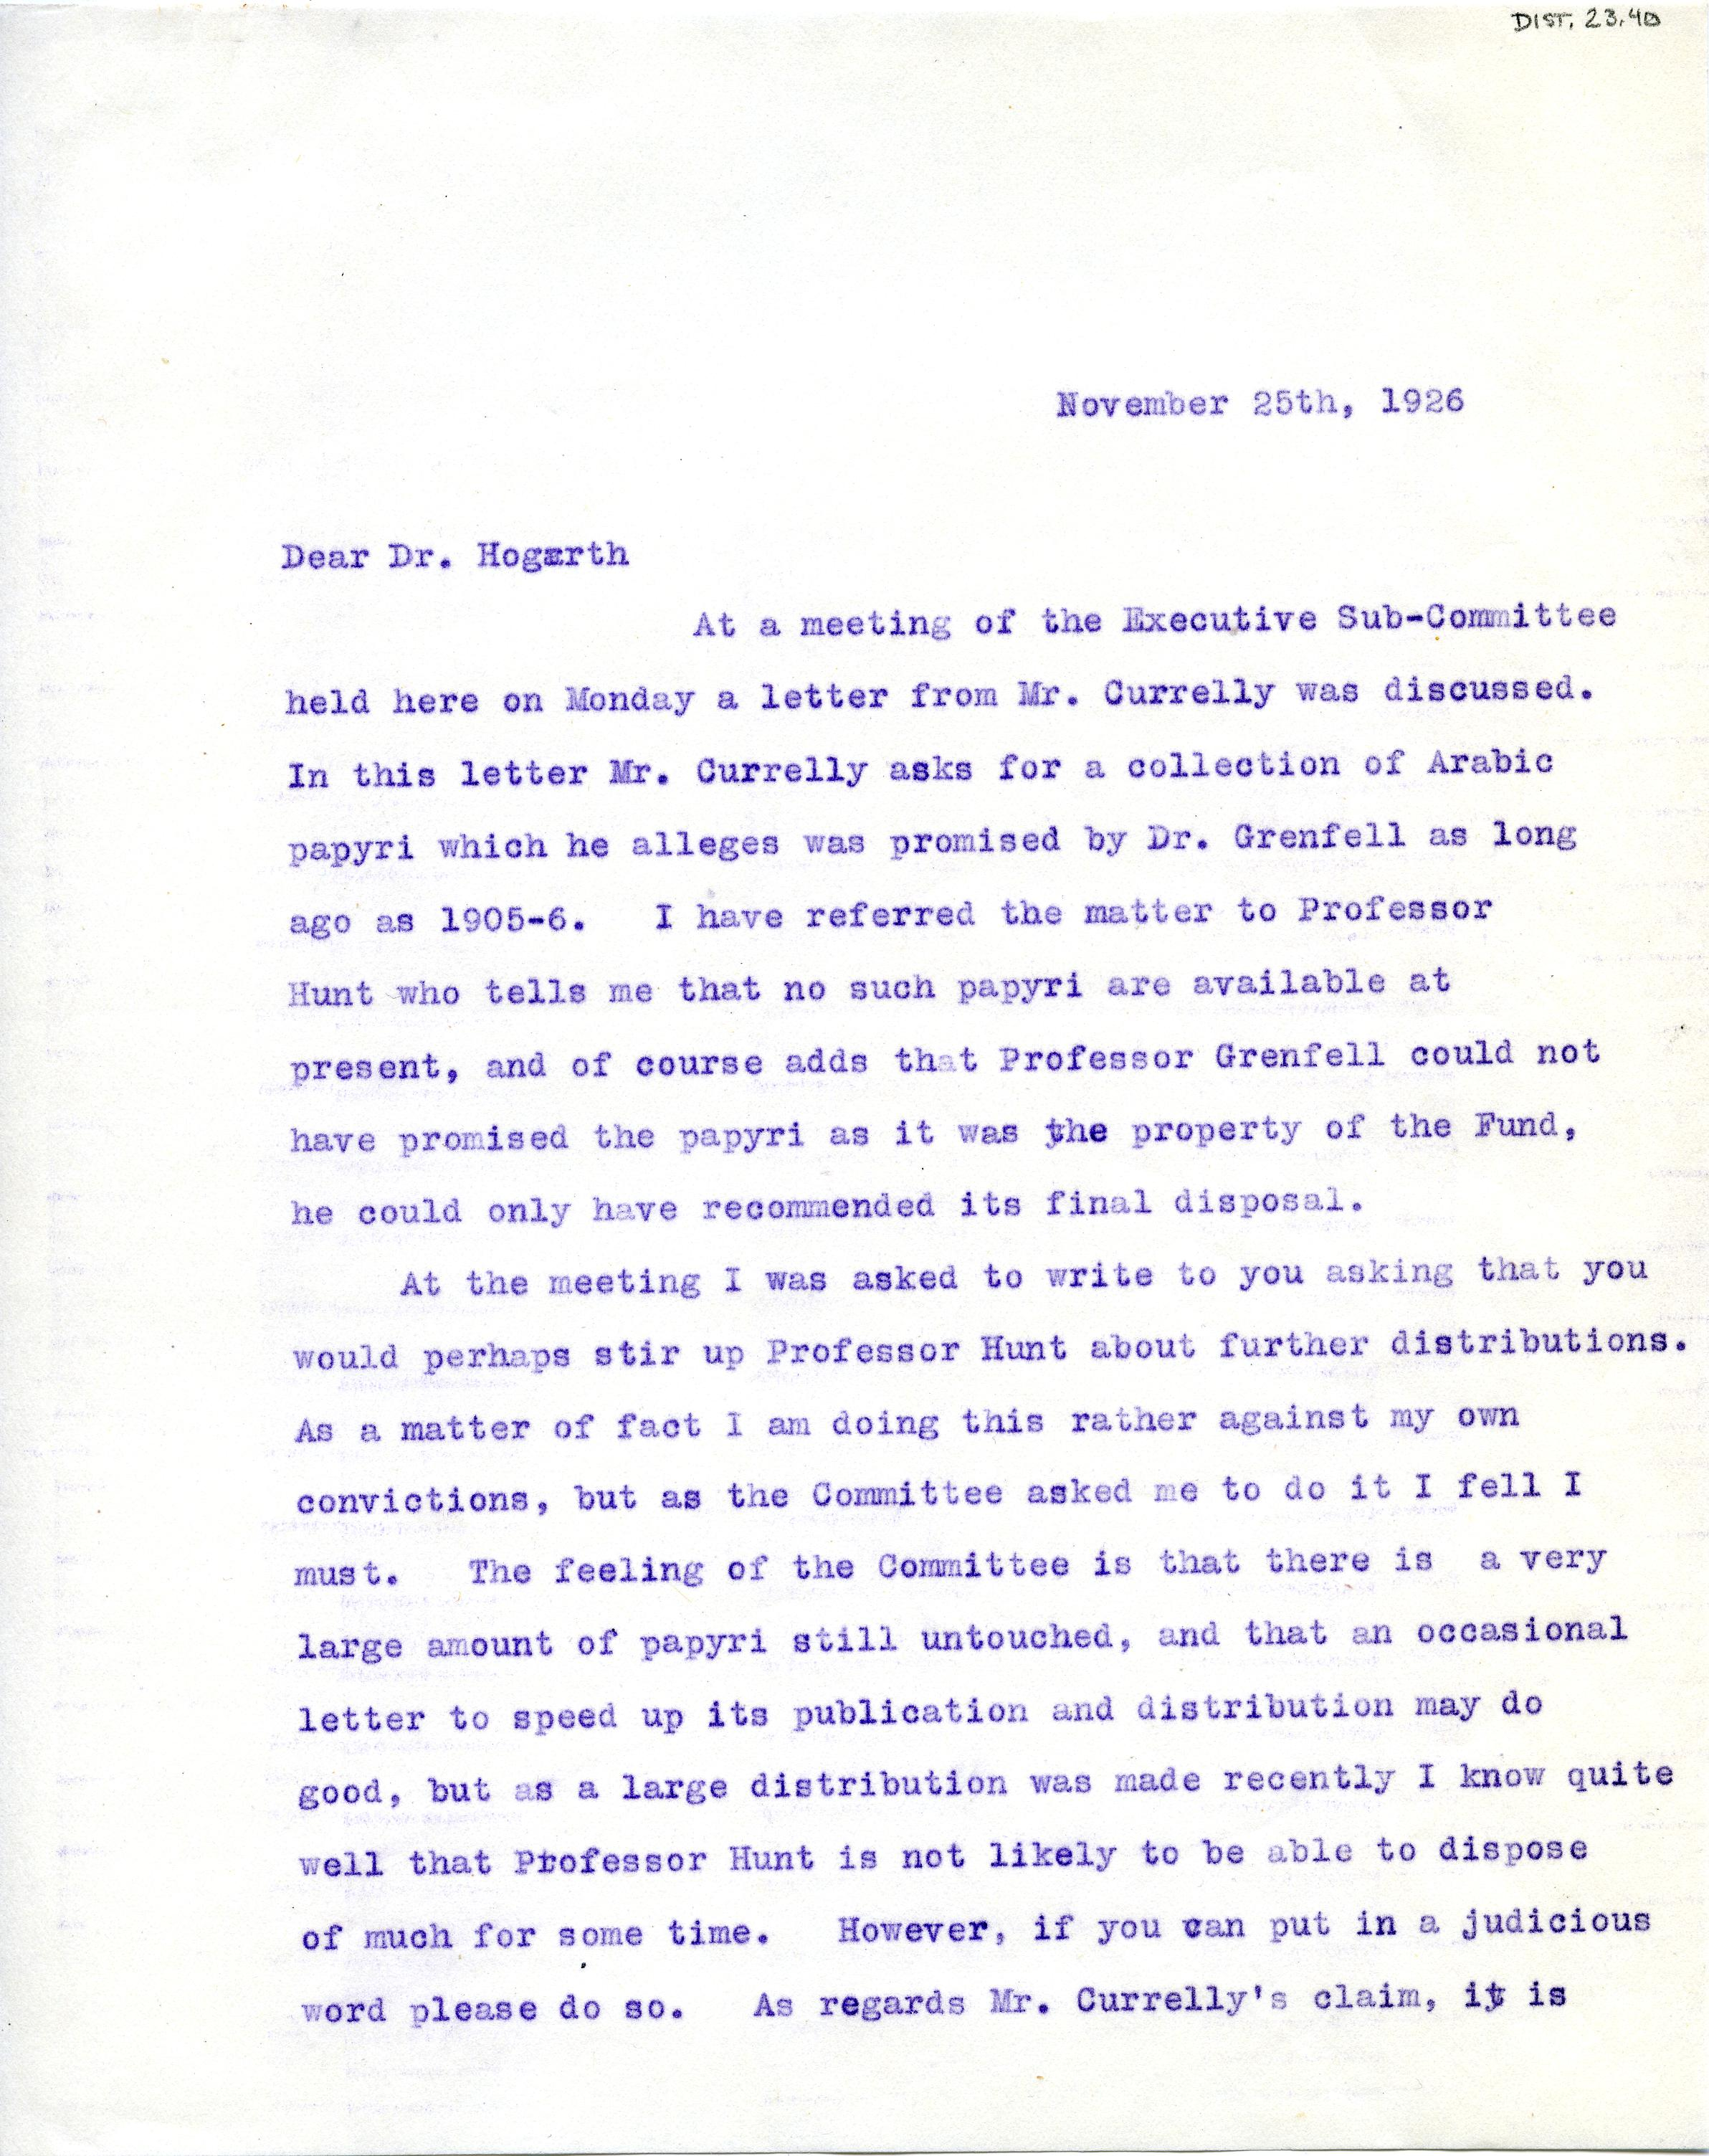 1904-05 Sinai, Deir el-Bahri, Oxyrhynchus, Naukratis DIST.23.40a